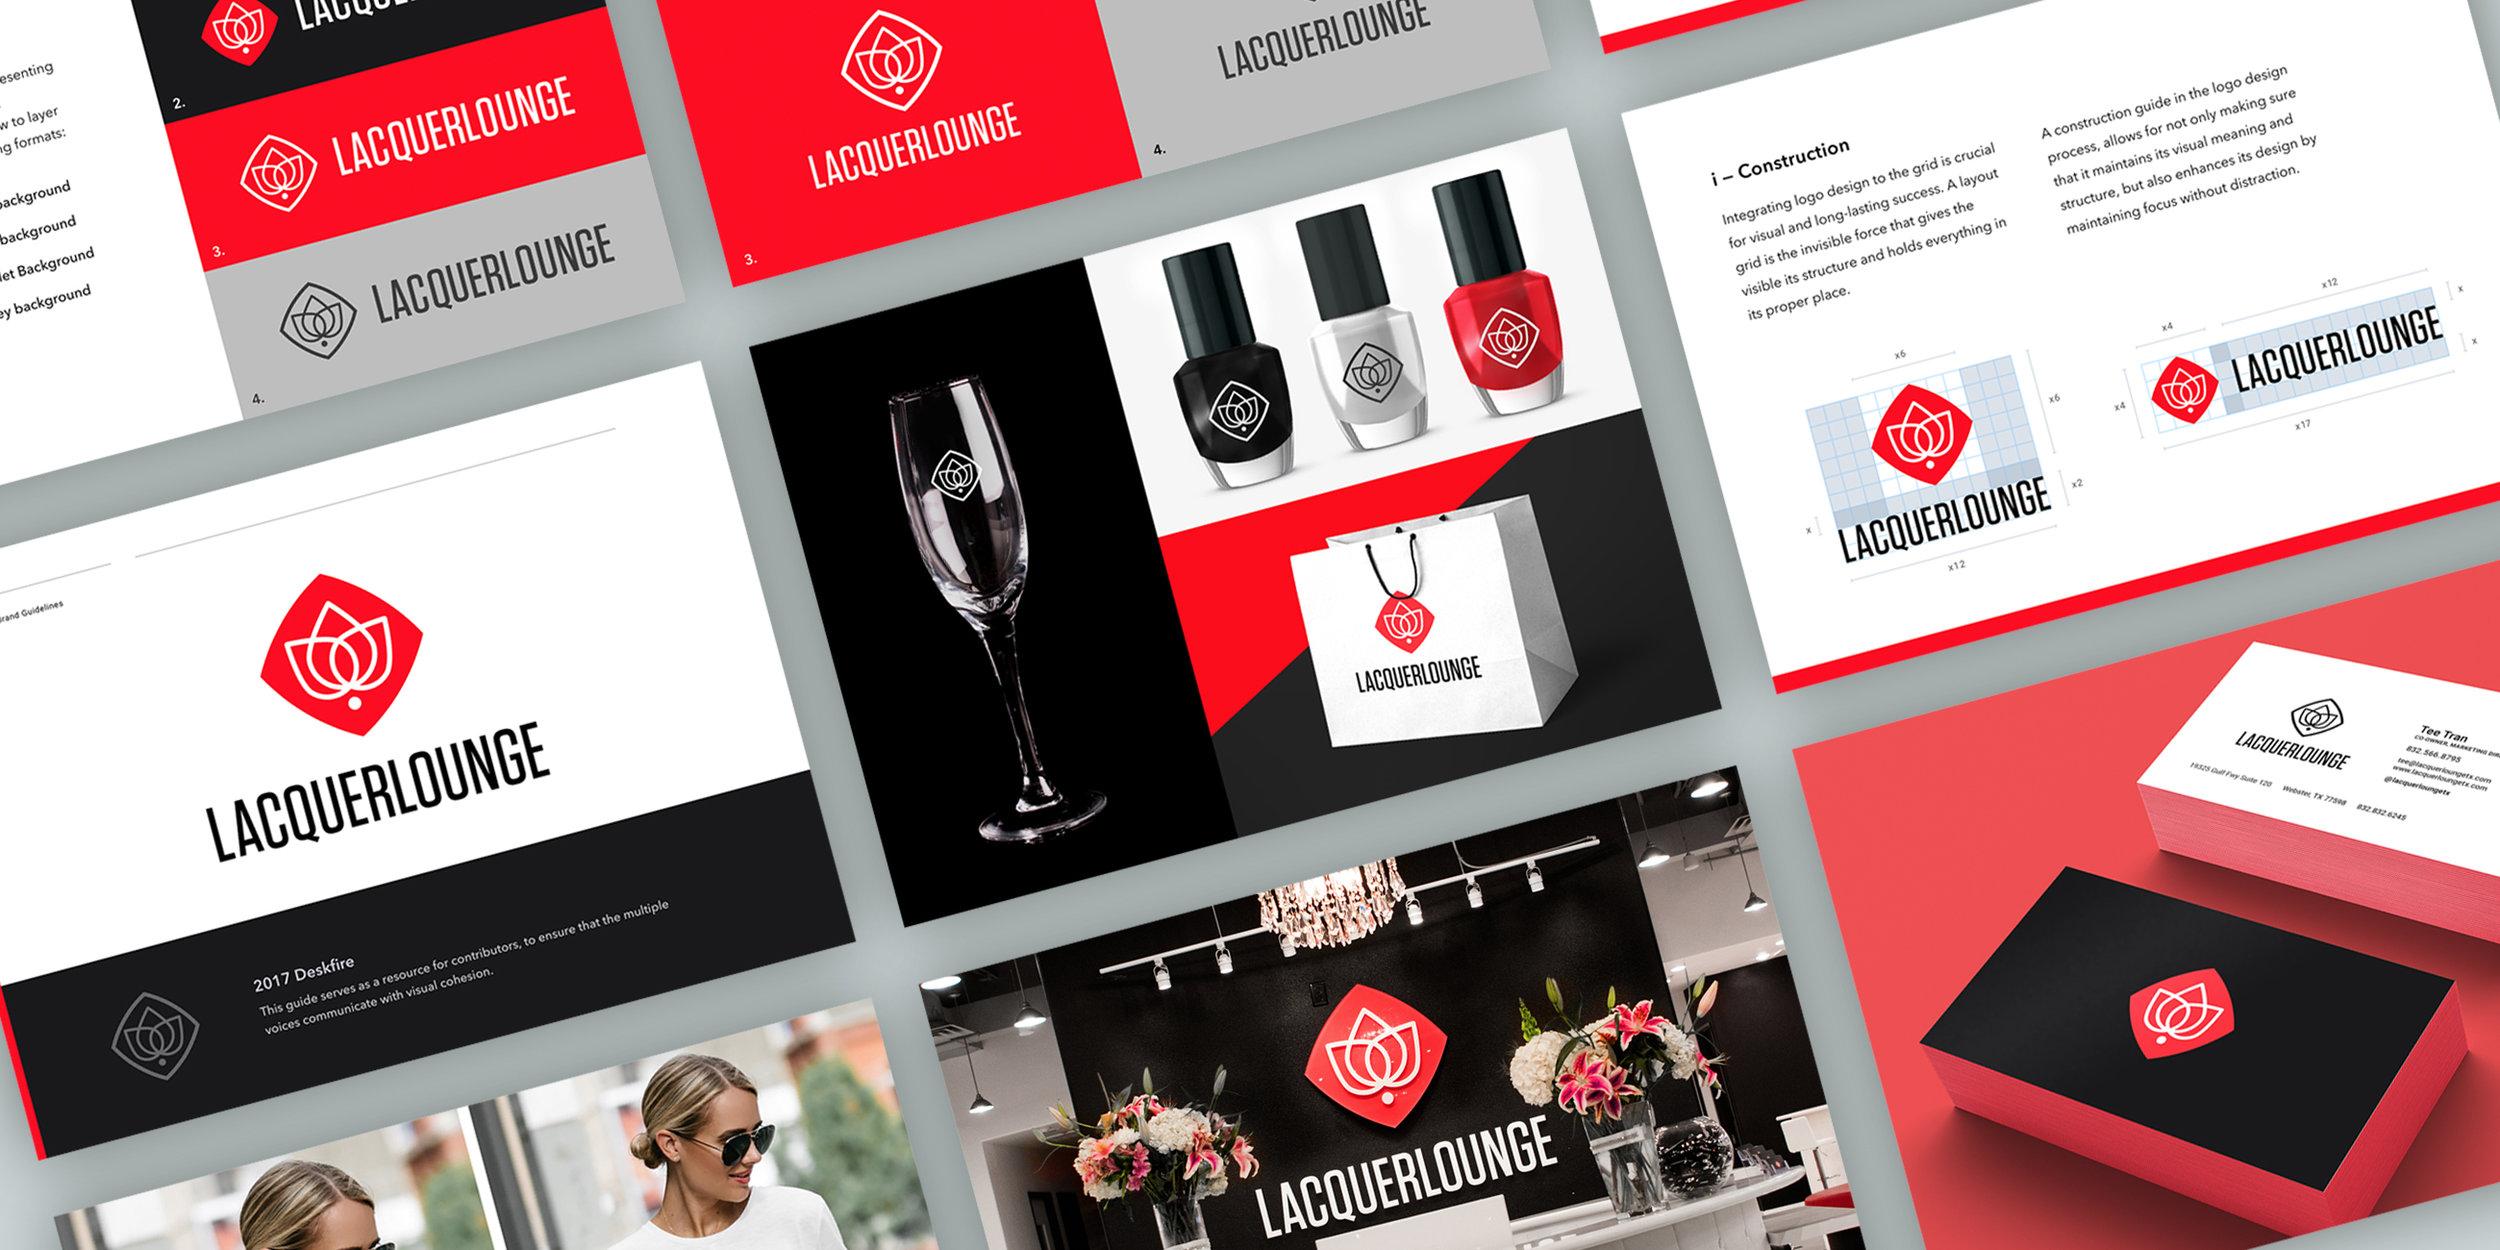 branding-macquarrie.jpg